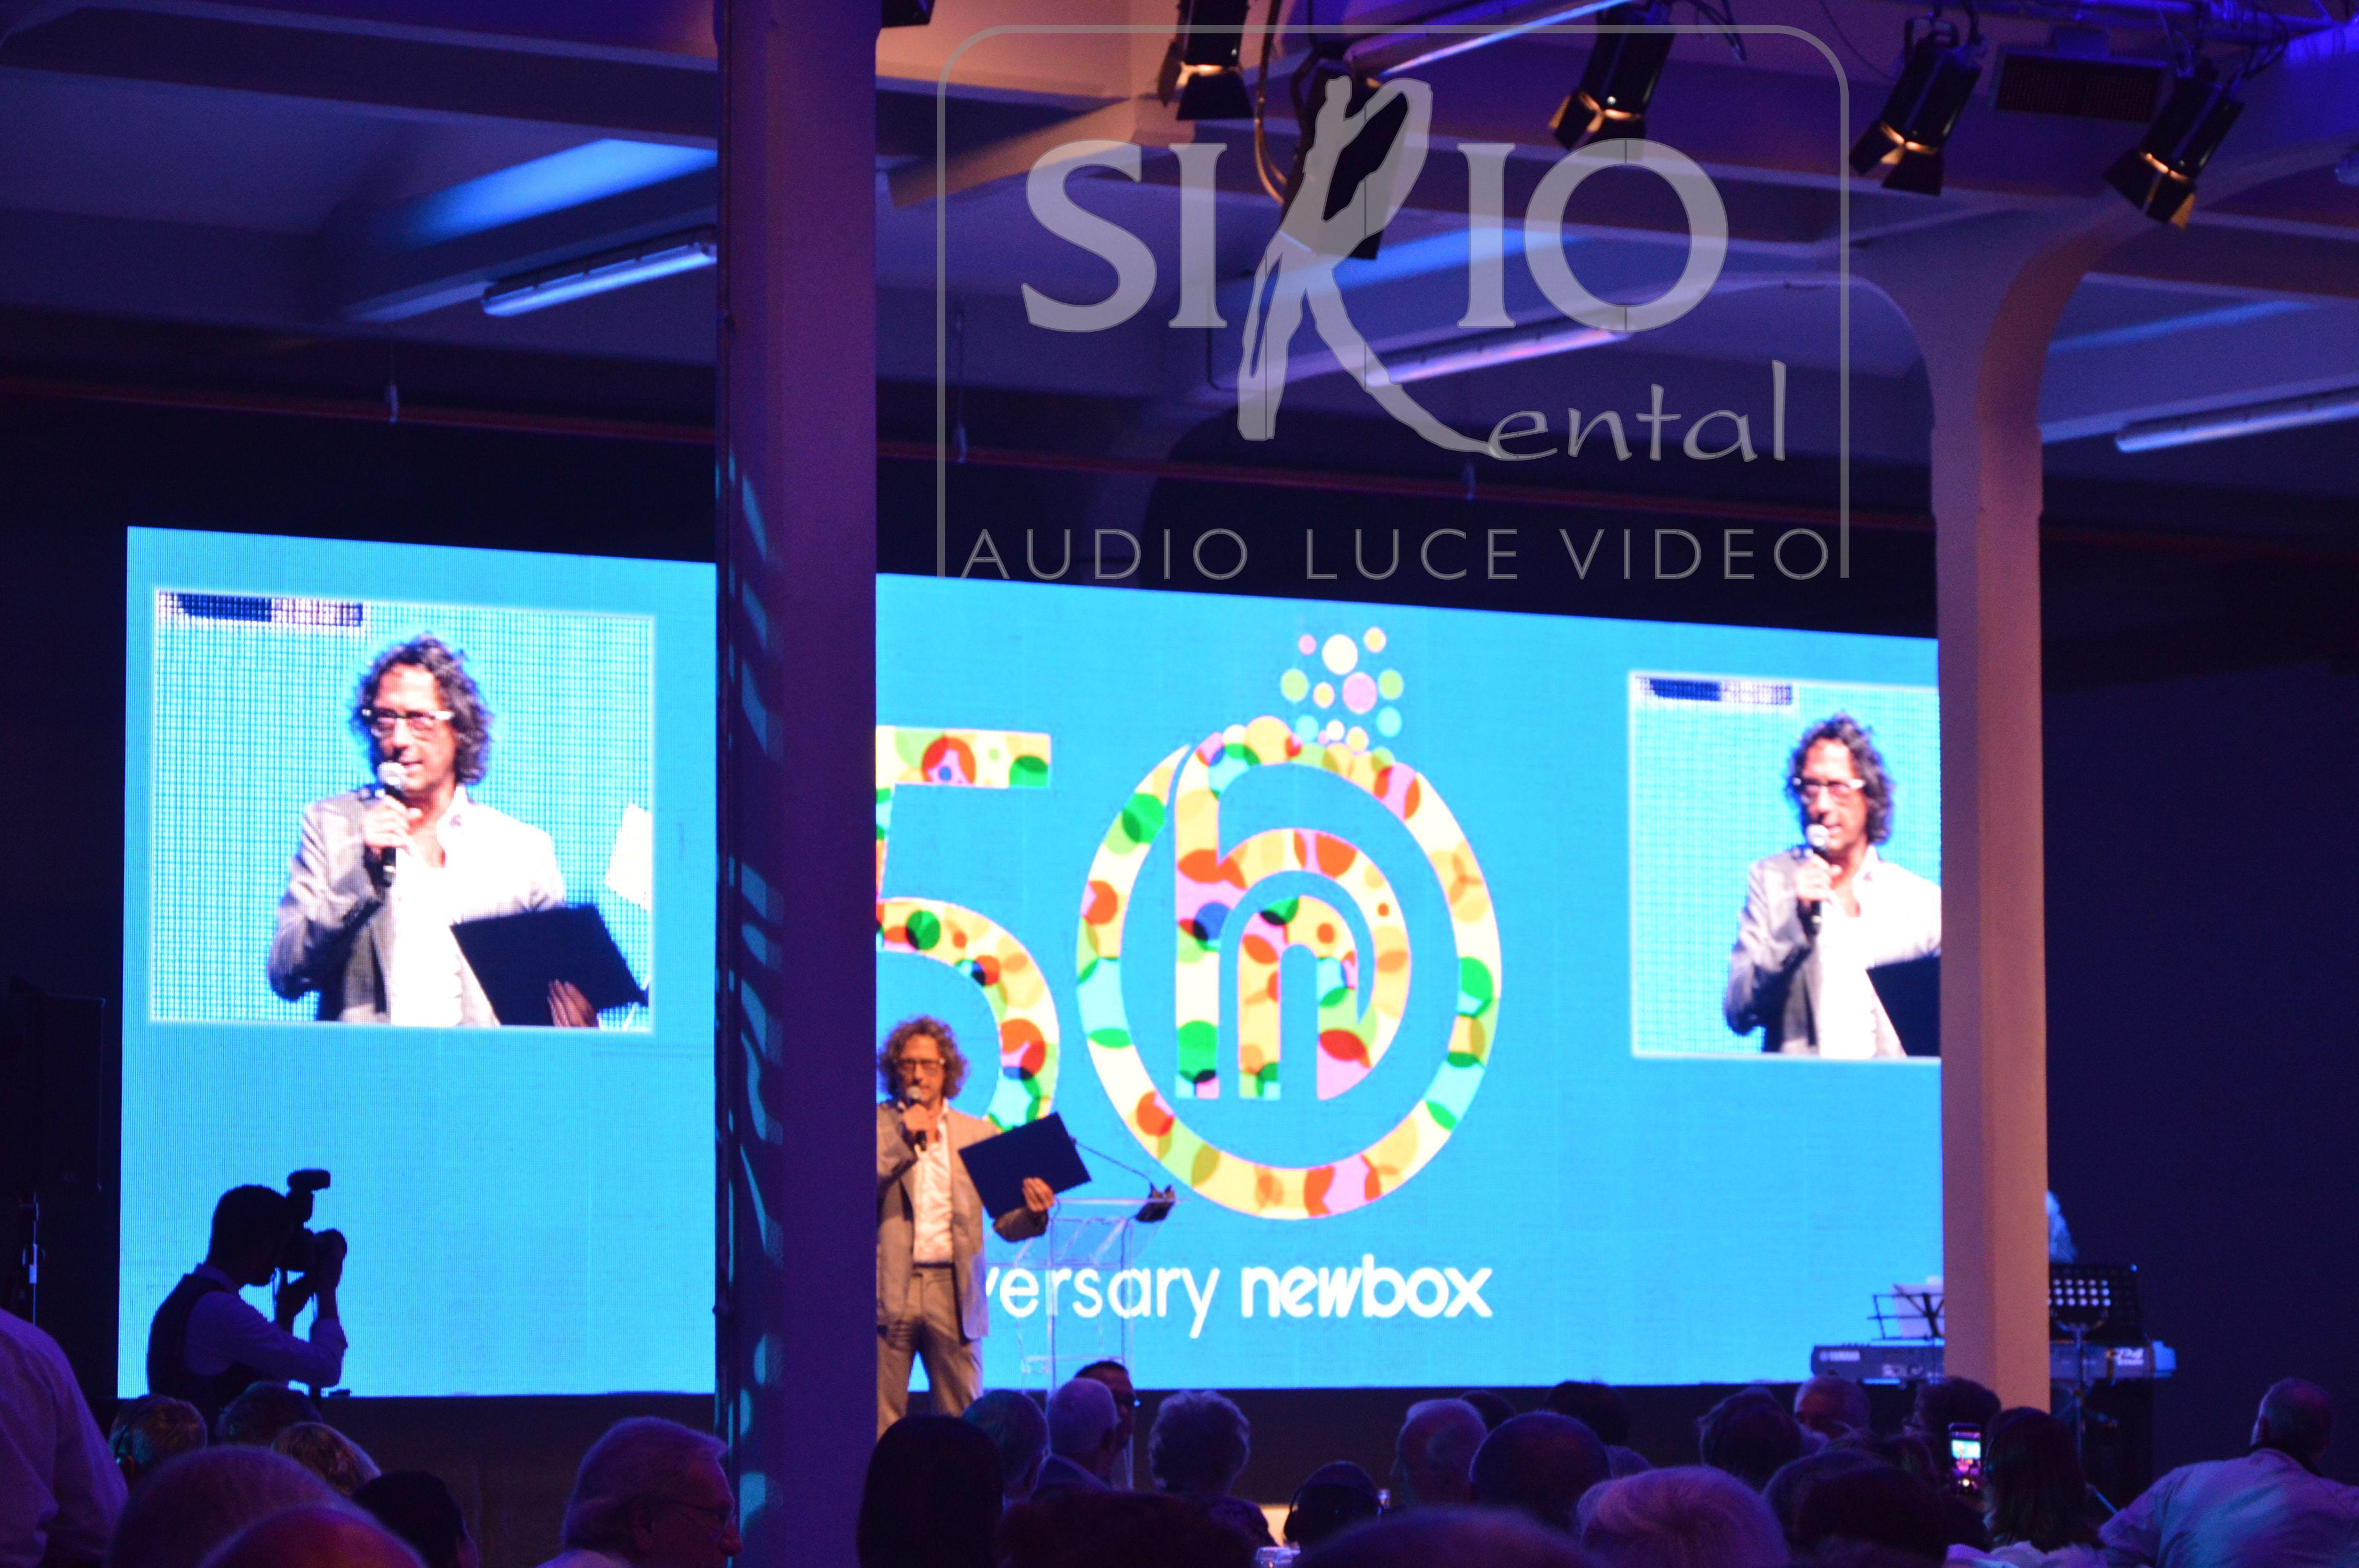 newbox 50 esimo aziendale tondello tecnologie luci audio video ledwall